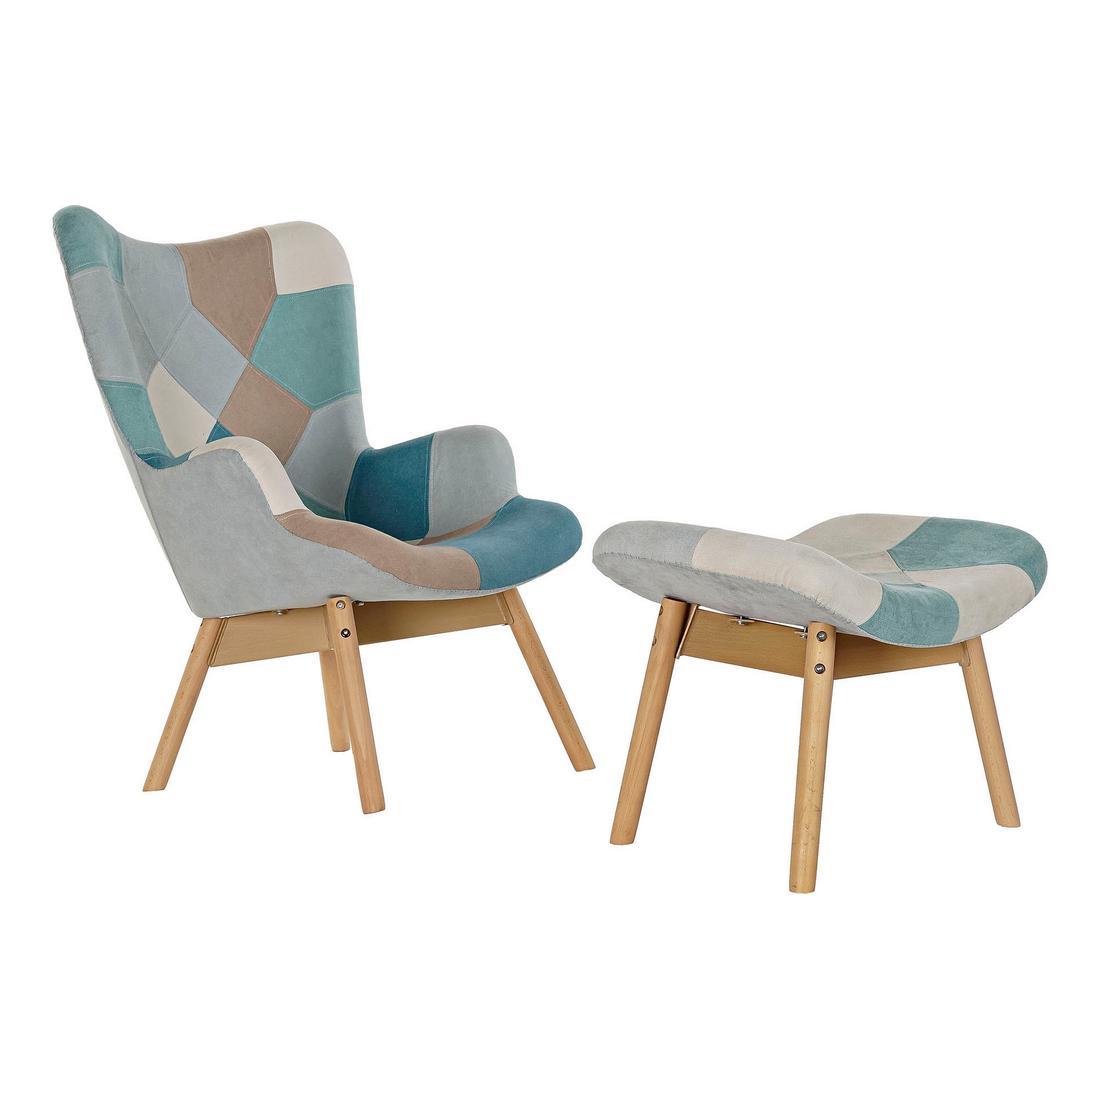 Armchair DKD Home Decor Beige Polyester Pinewood Sky blue (70 x 70 x 95 cm) (2 pcs)